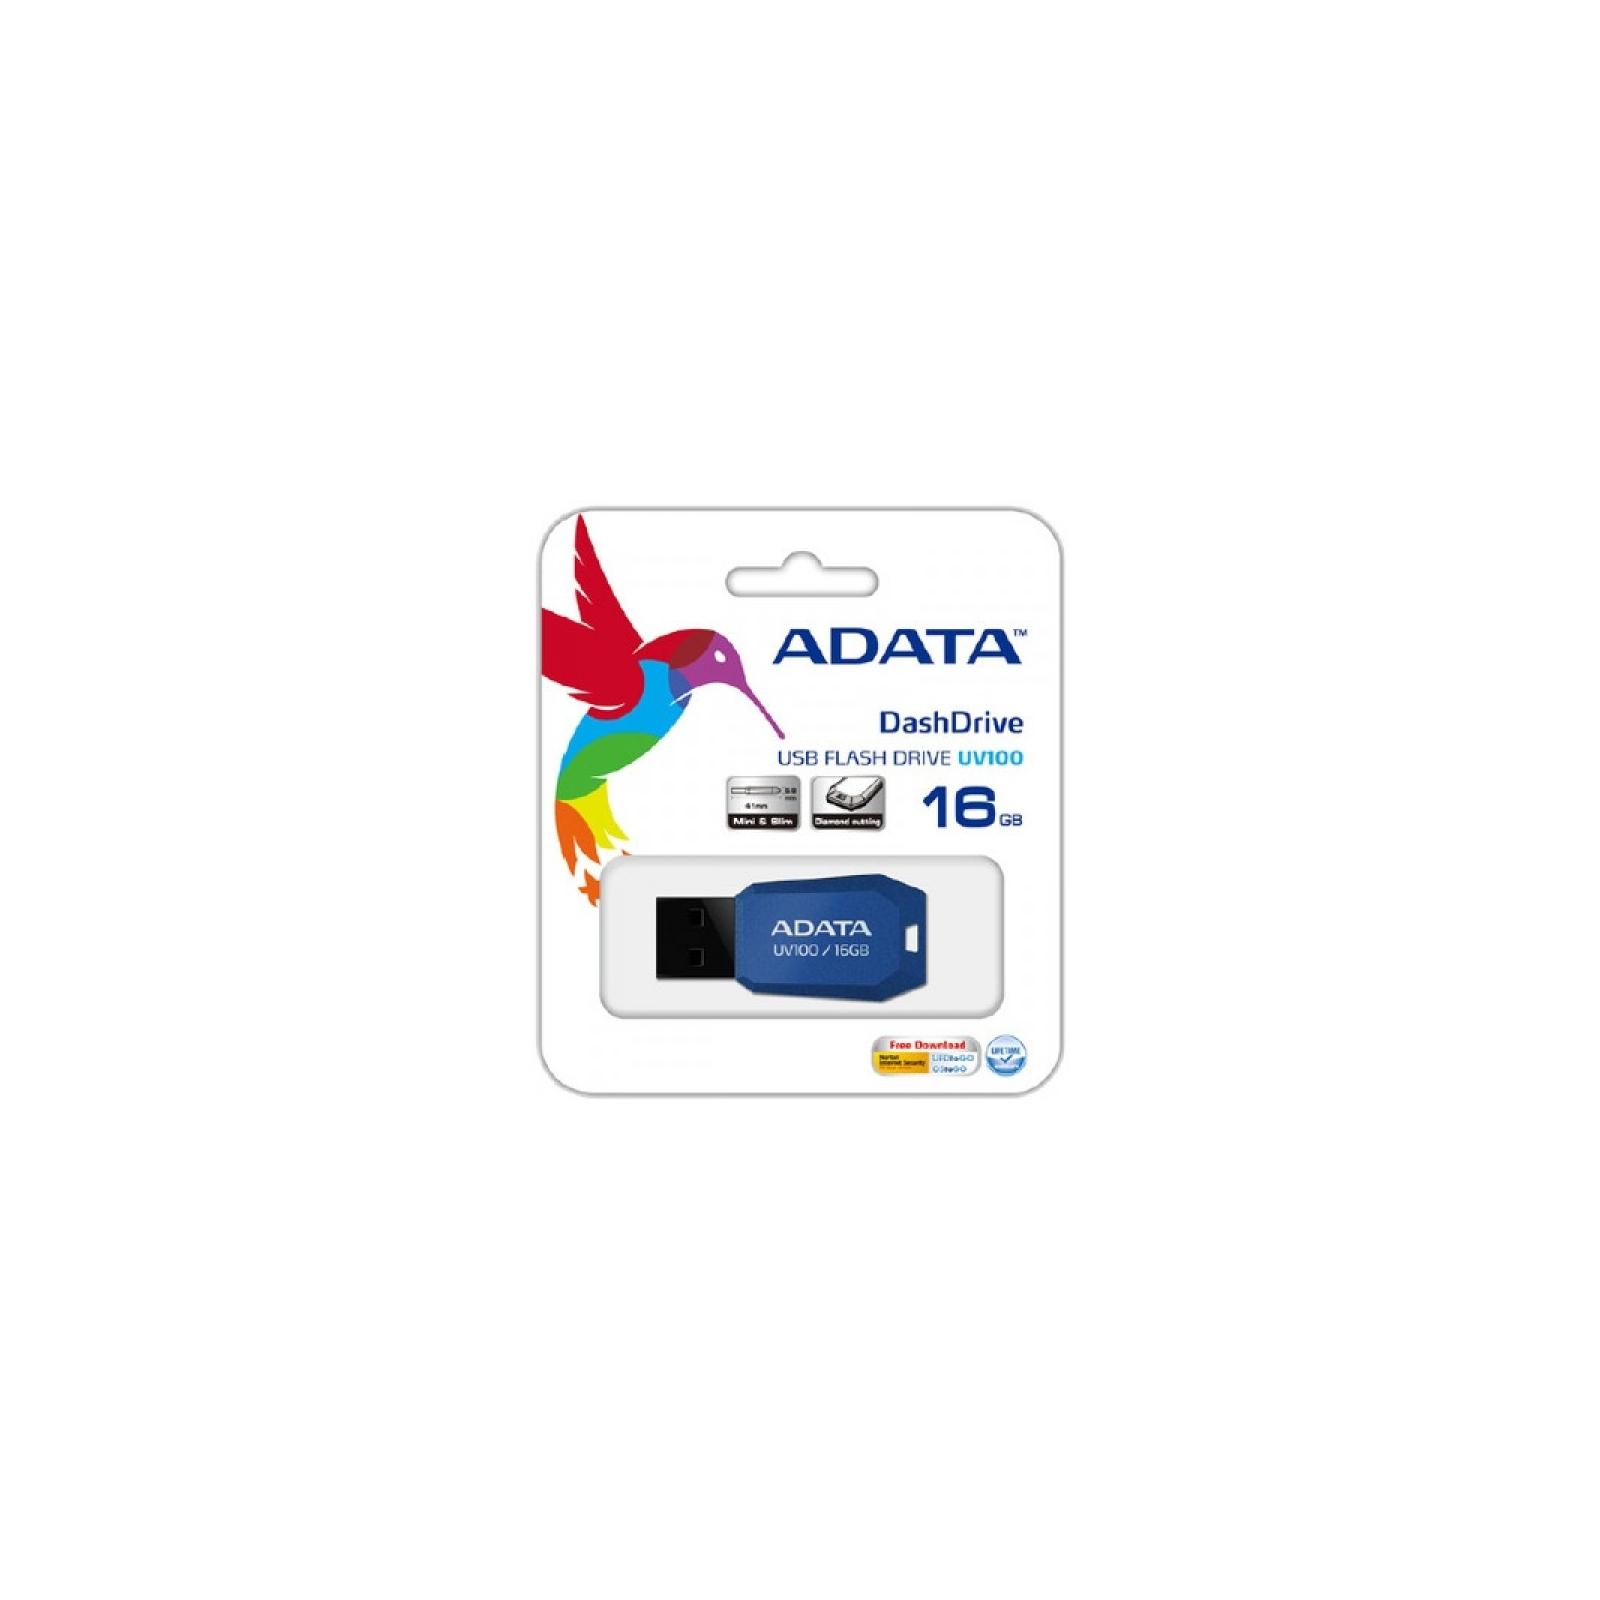 USB флеш накопитель ADATA 32GB DashDrive UV100 Blue USB 2.0 (AUV100-32G-RBL) изображение 3